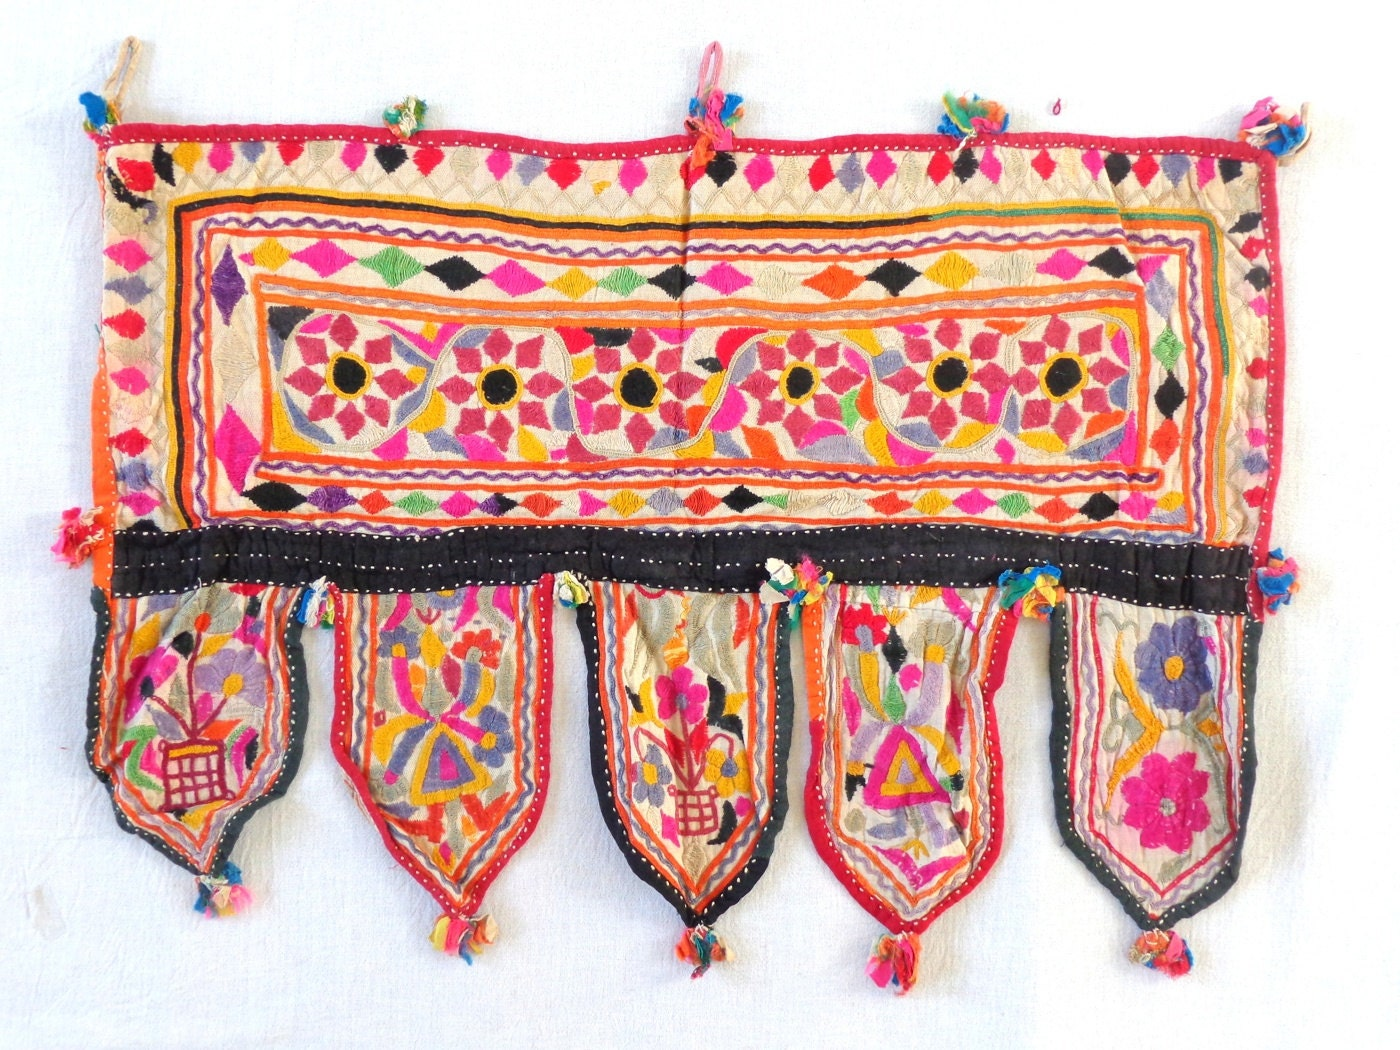 Vintage Bohemian Home decor Vintage Kutch by craftsofgujarat